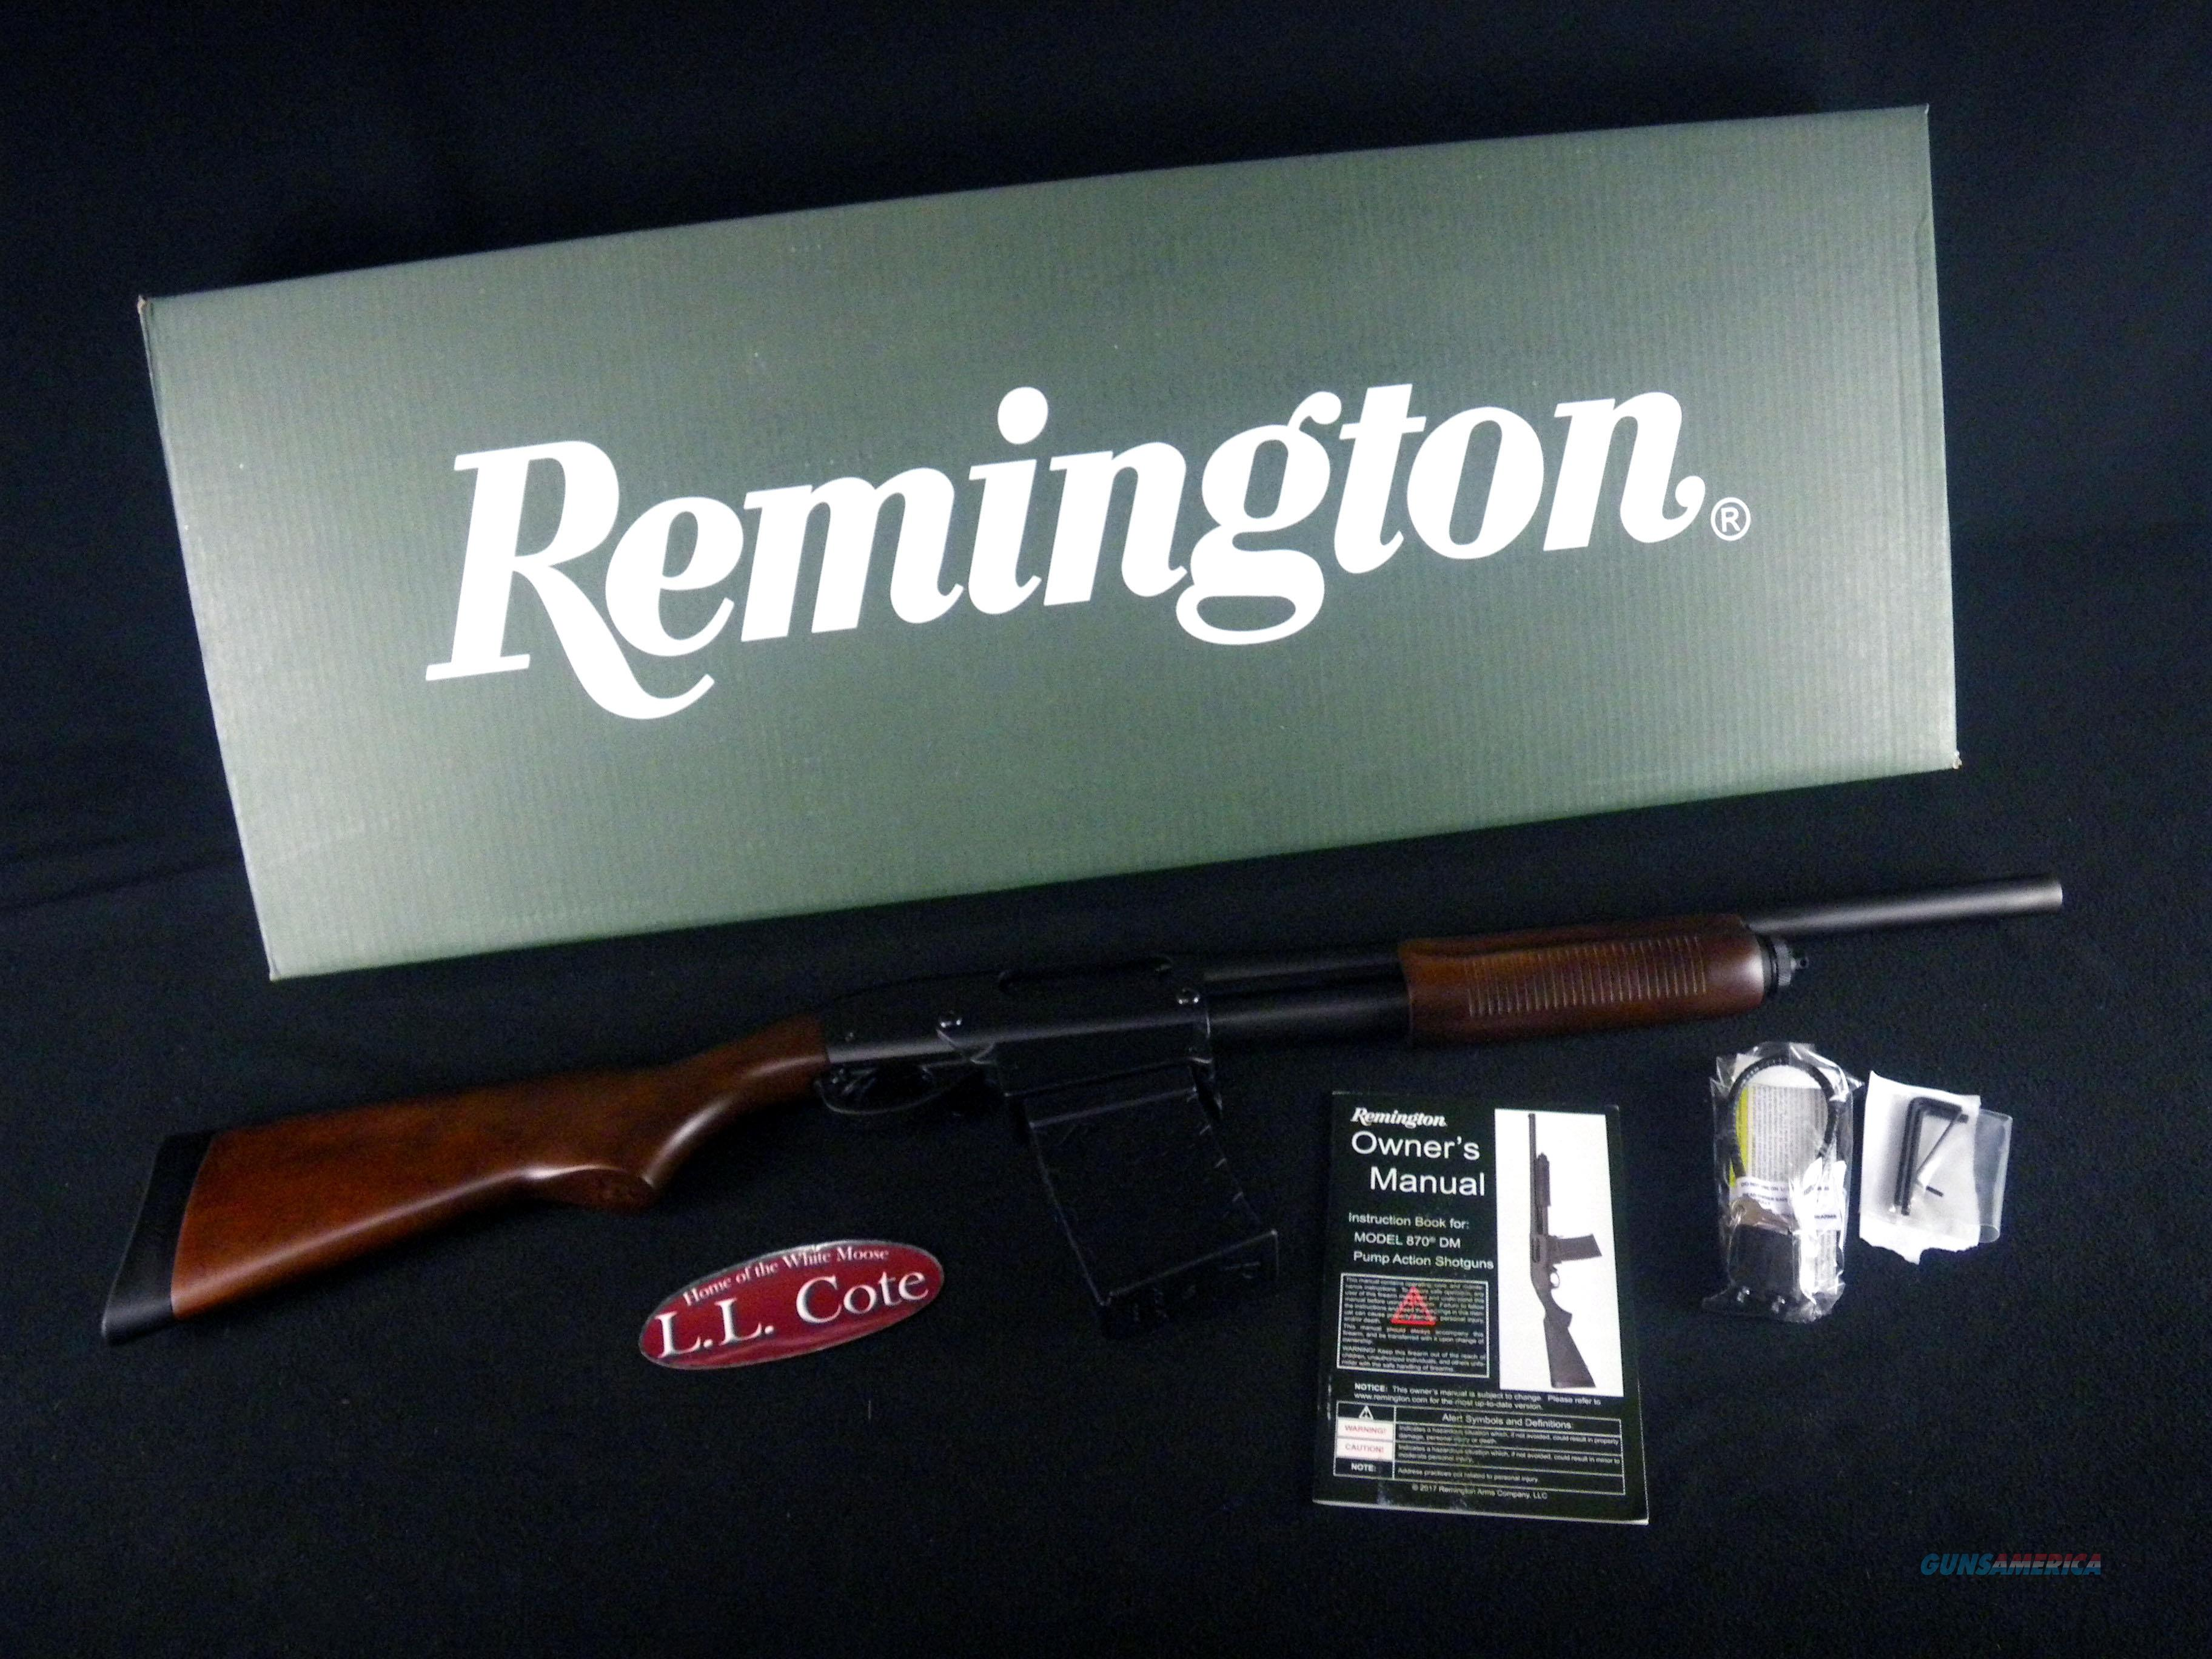 "Remington Model 870 DM Hardwood 12ga 18.5"" NEW 3"" 81351  Guns > Shotguns > Remington Shotguns  > Pump > Hunting"